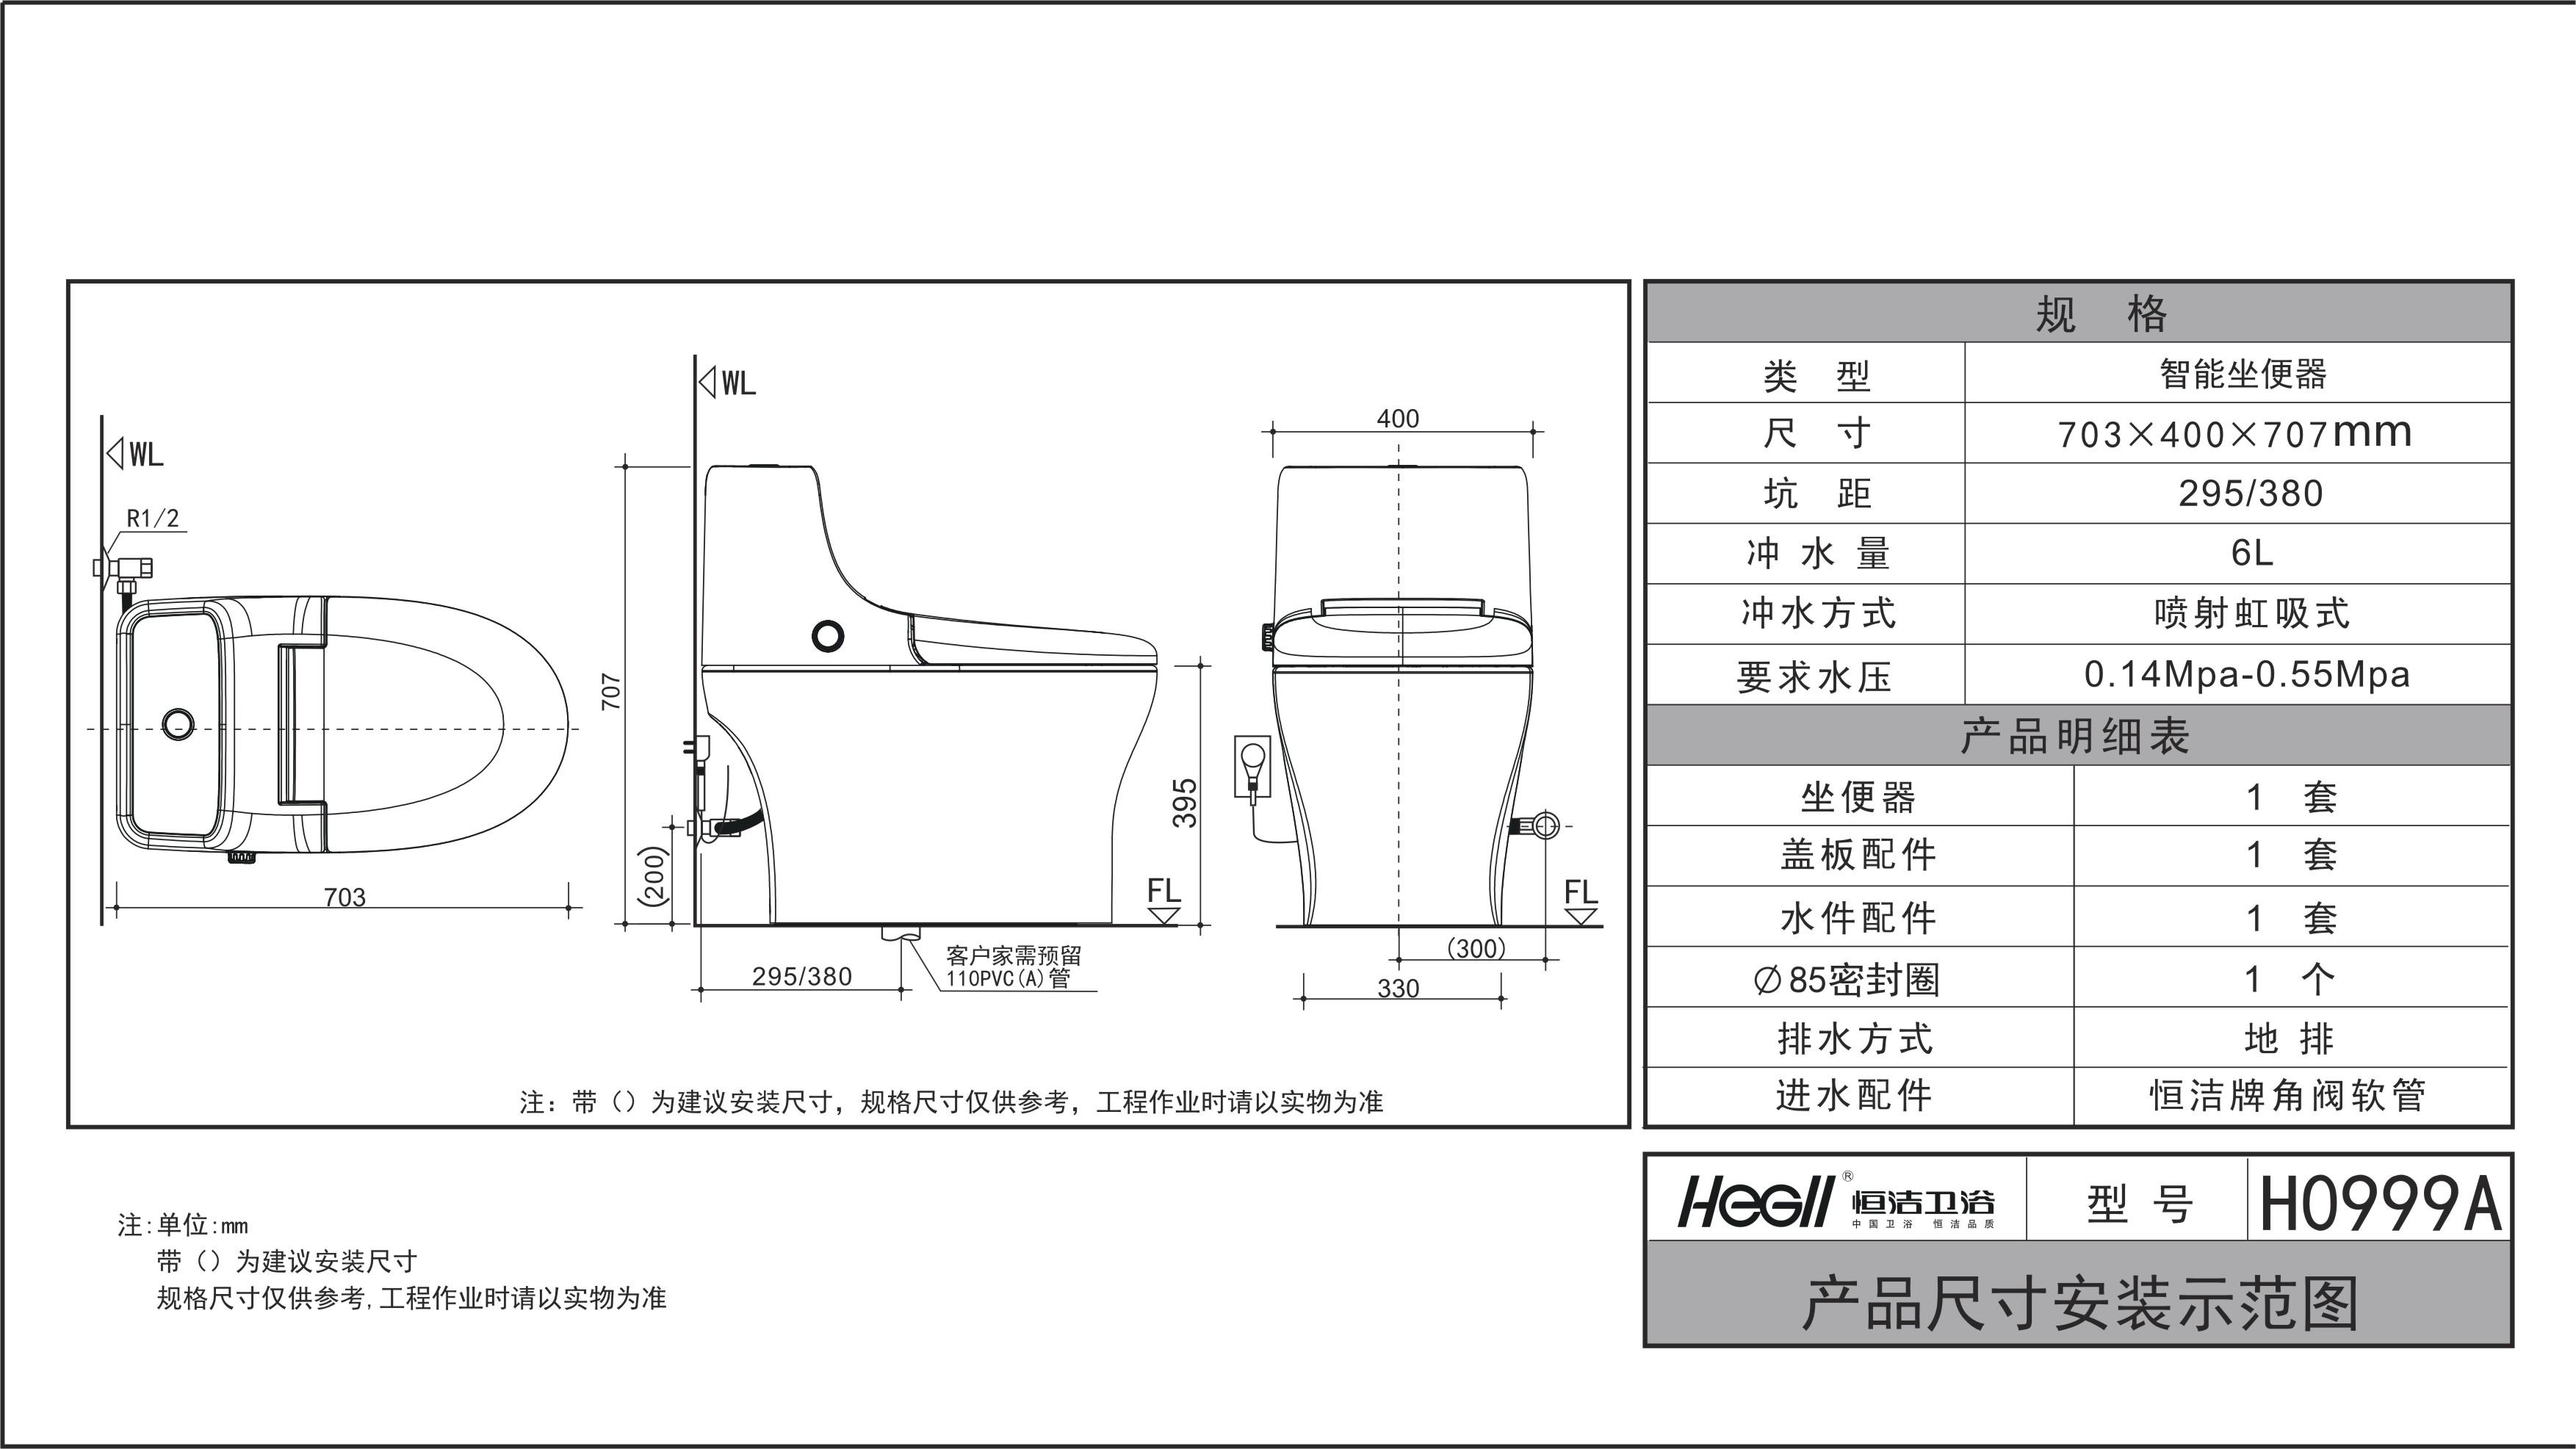 h0999a产品尺寸安装示范图